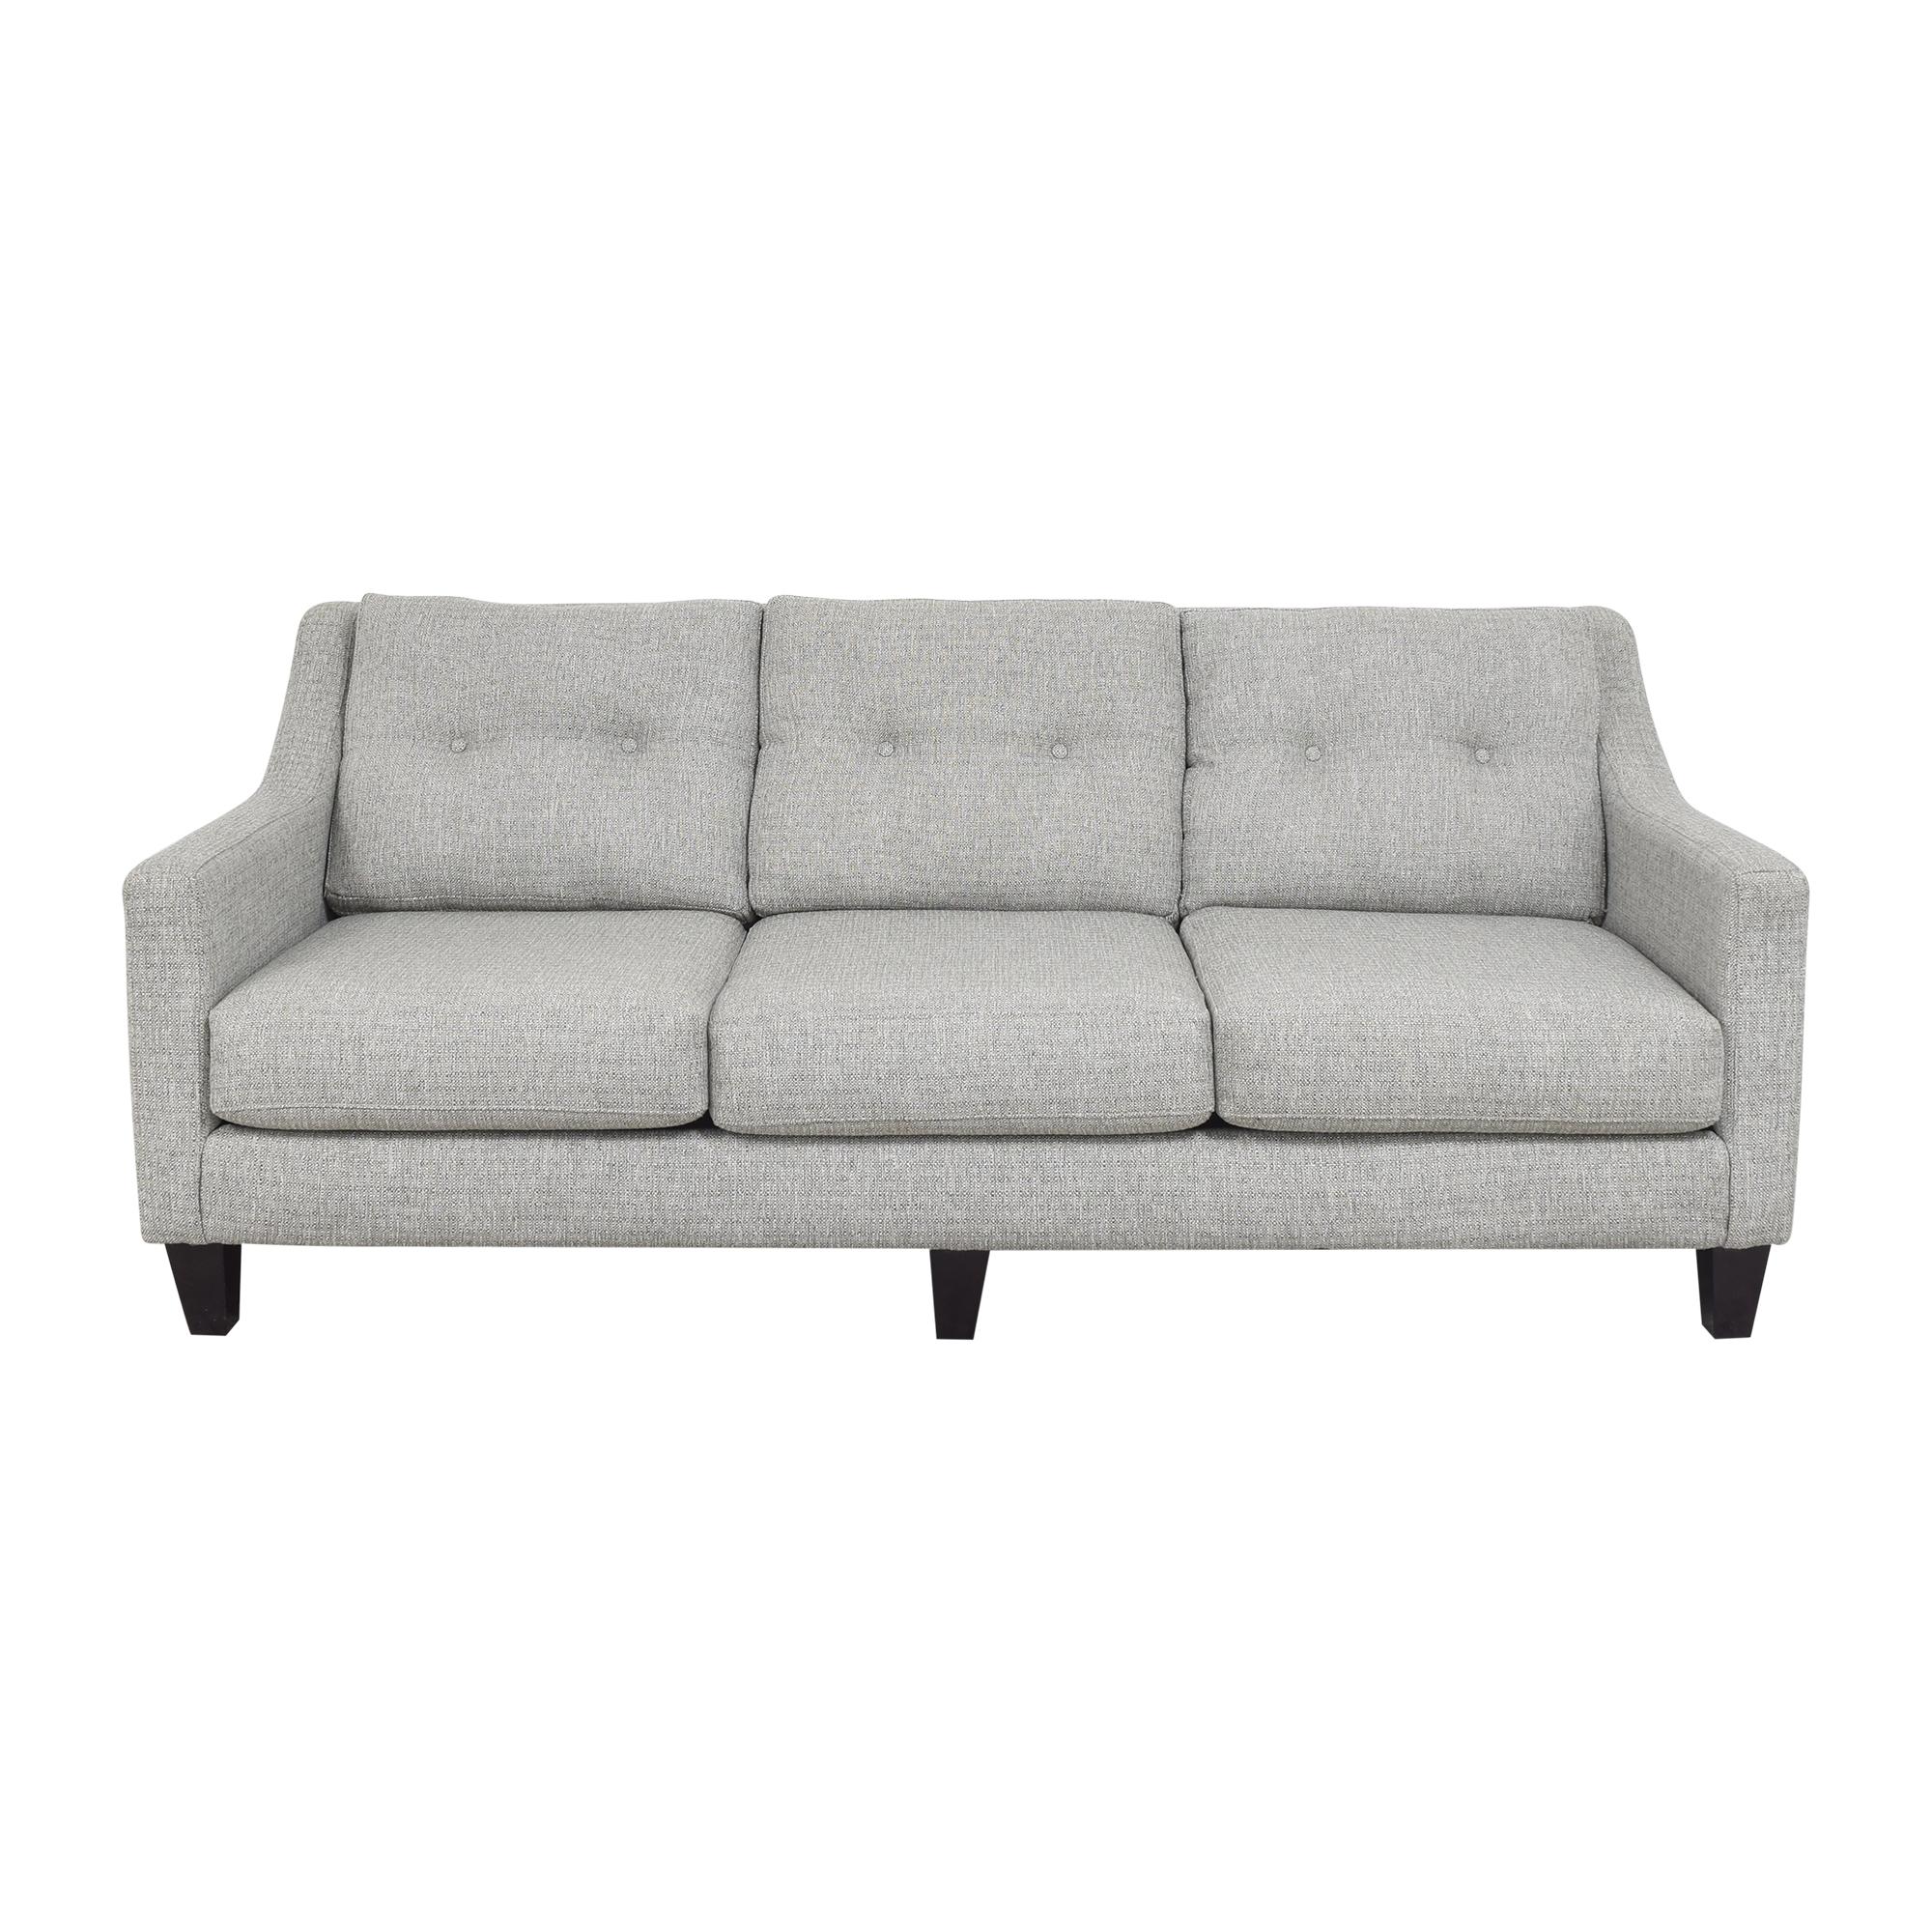 Raymour & Flanigan Raymour & Flanigan Three Cushion Sofa discount